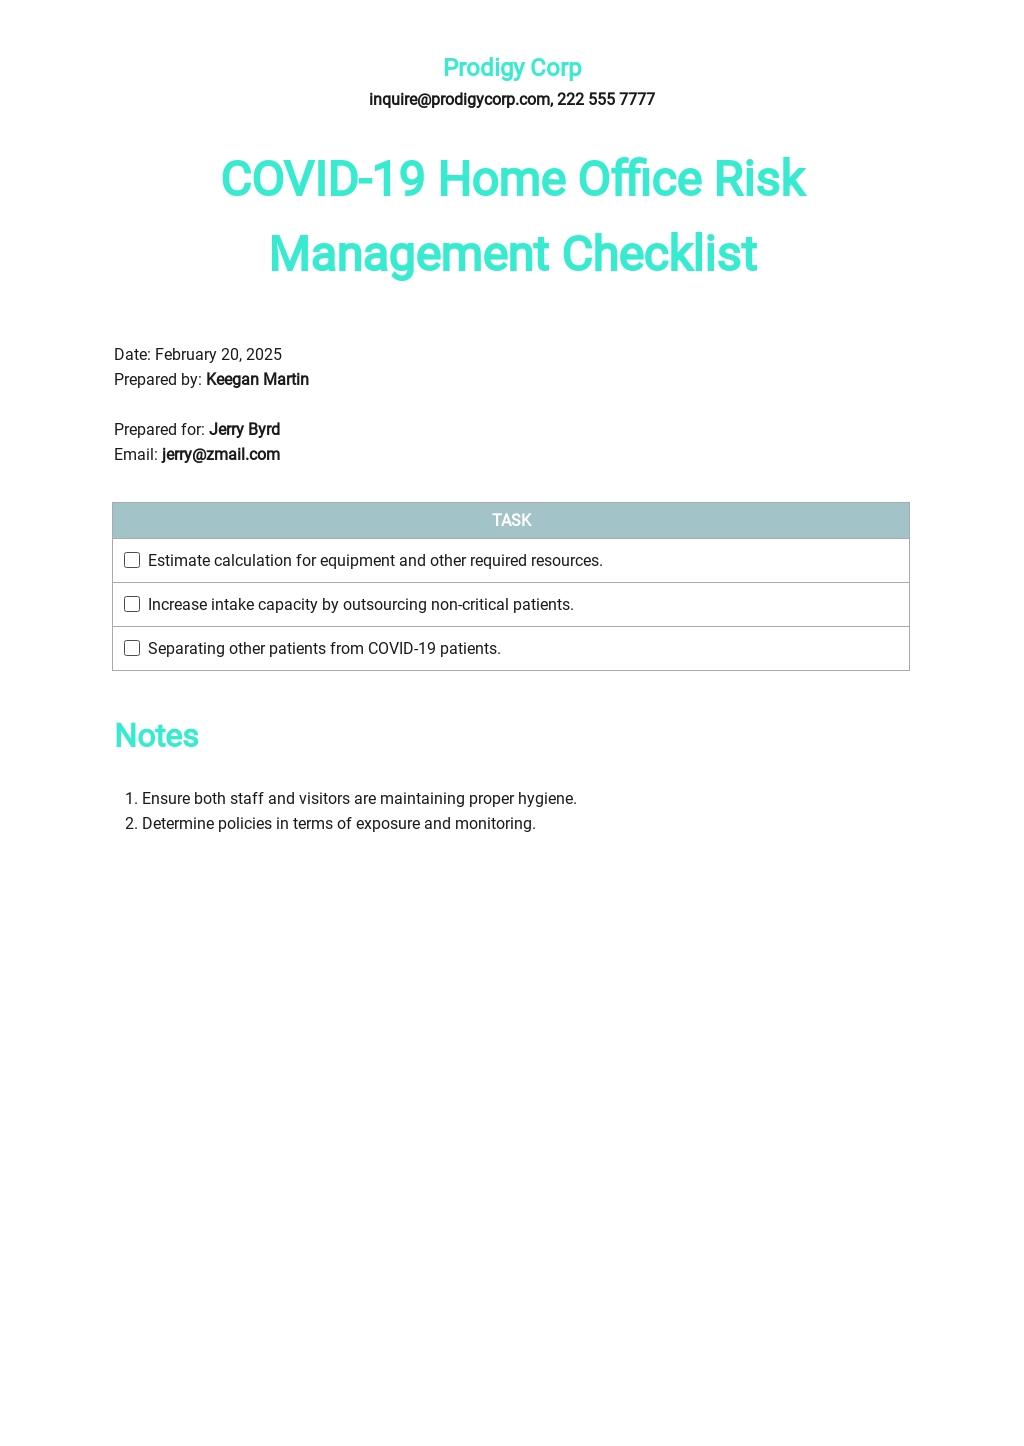 Coronavirus COVID-19 Home Office Risk Management Checklist Template